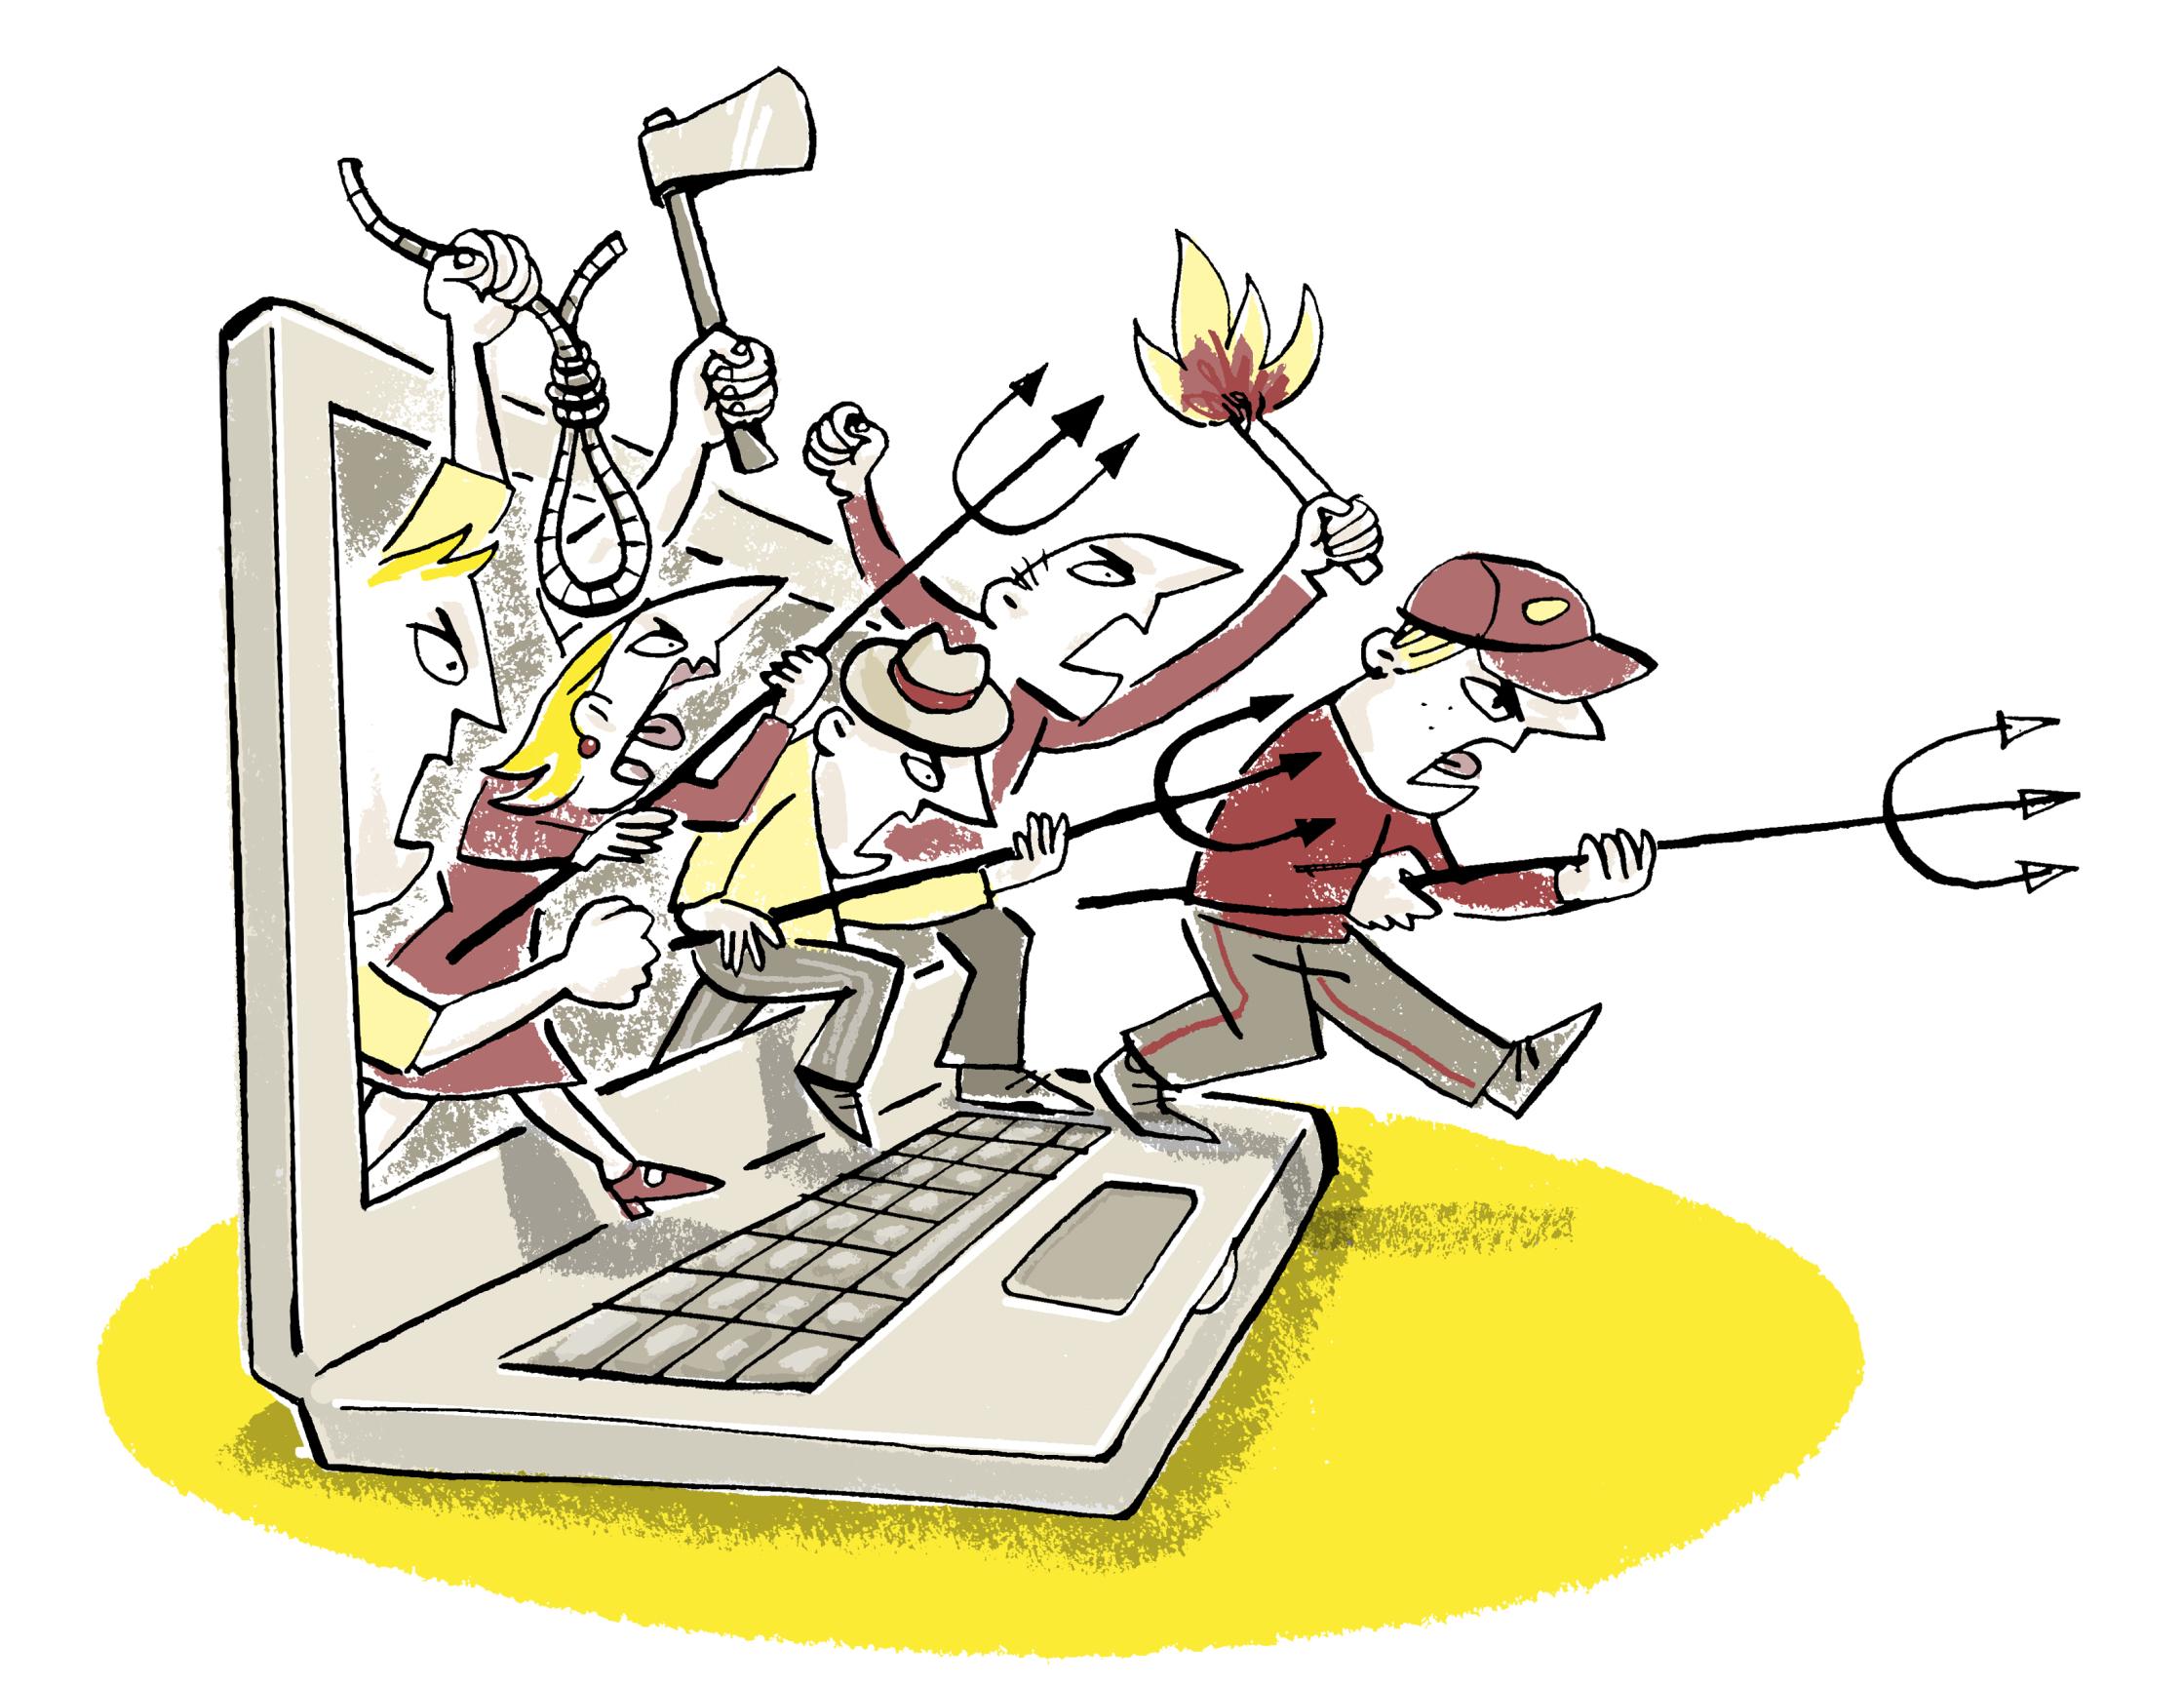 Online_lynch_mob.jpg